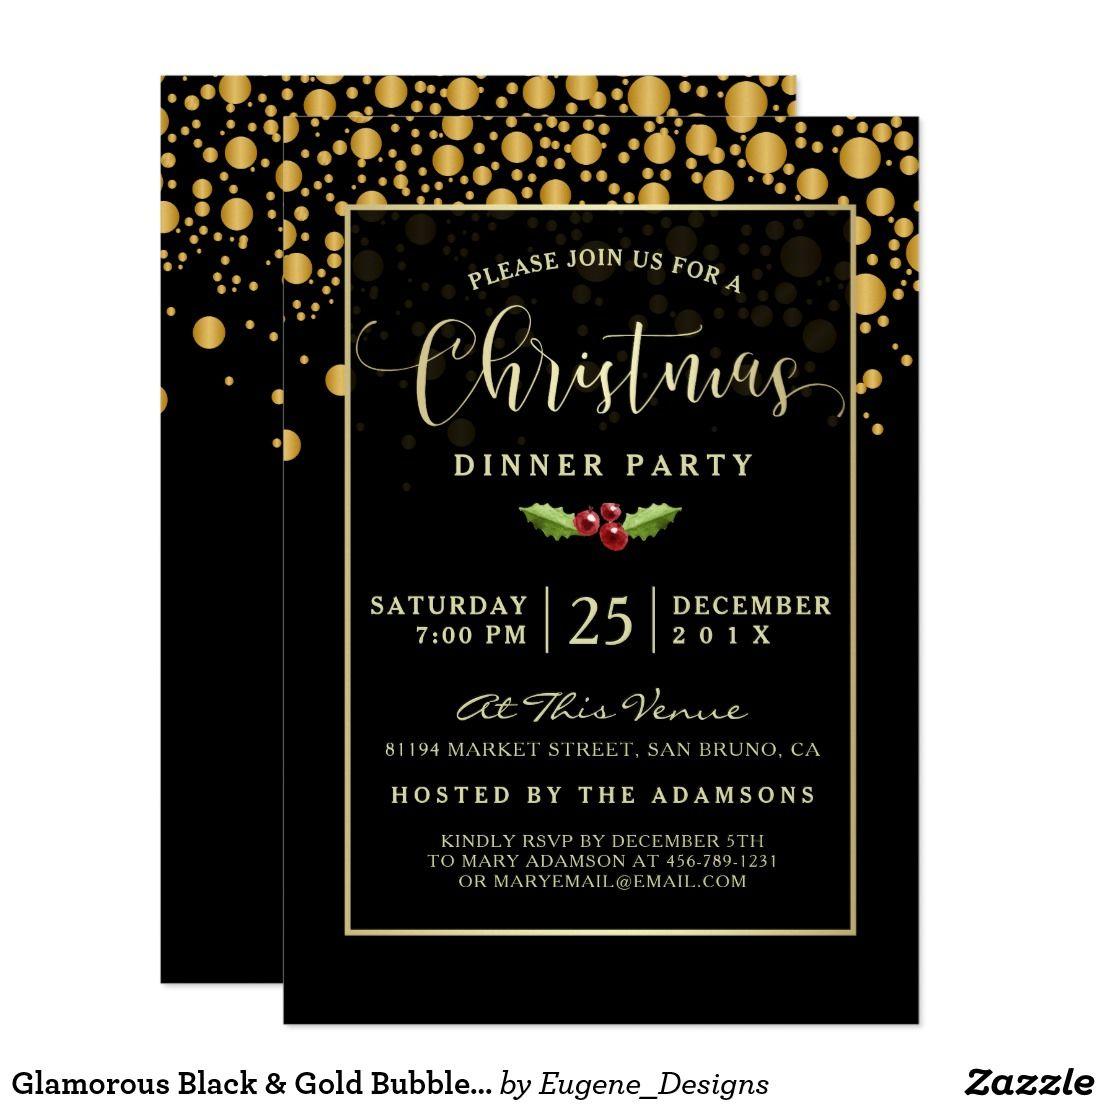 Glamorous Black & Gold Bubbles Christmas Dinner Invitation